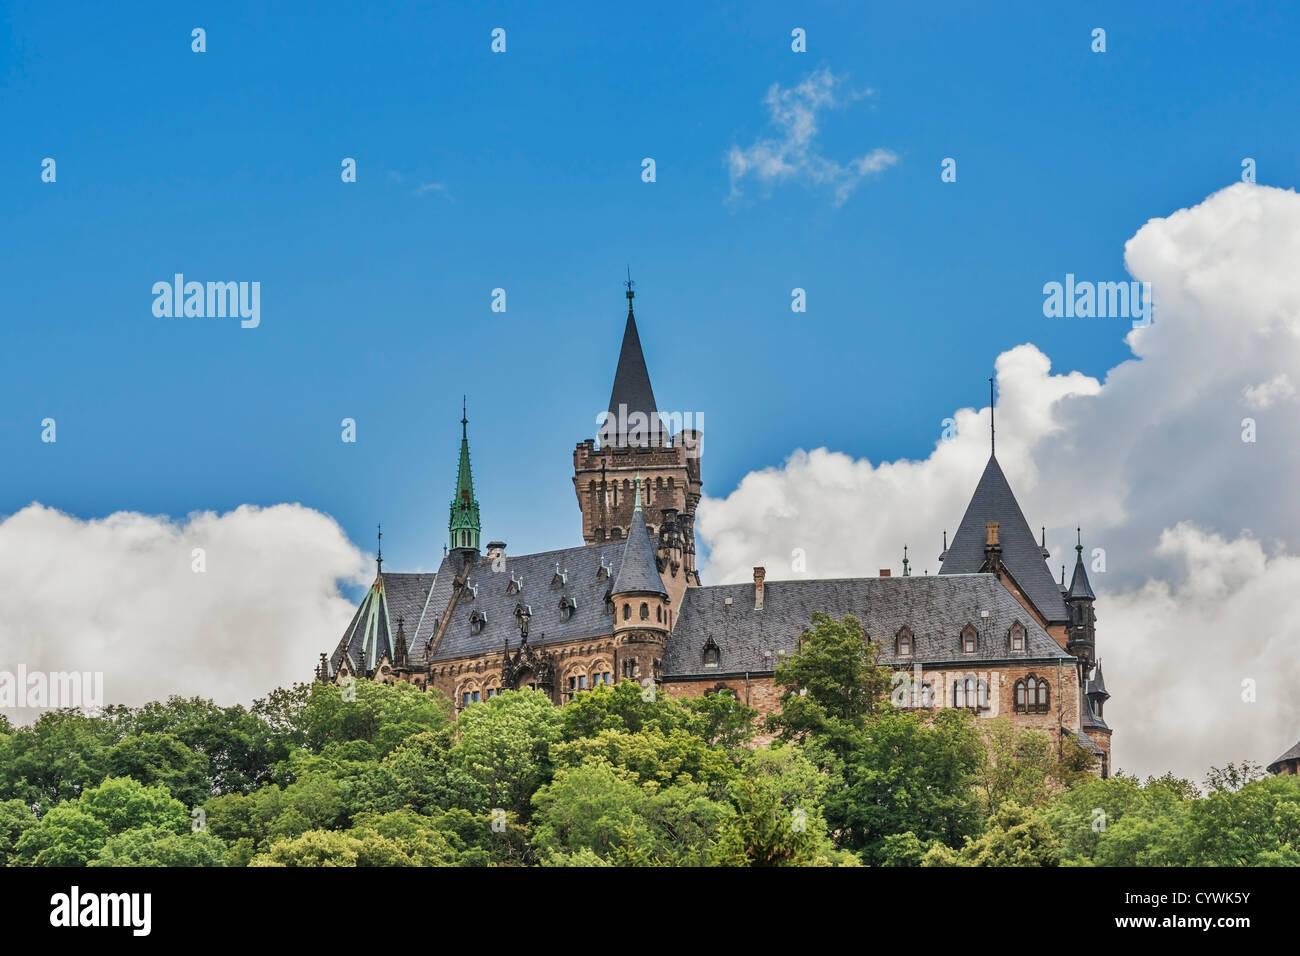 Wernigerode Castle, Harz, Saxony-Anhalt, Germany, Europe - Stock Image